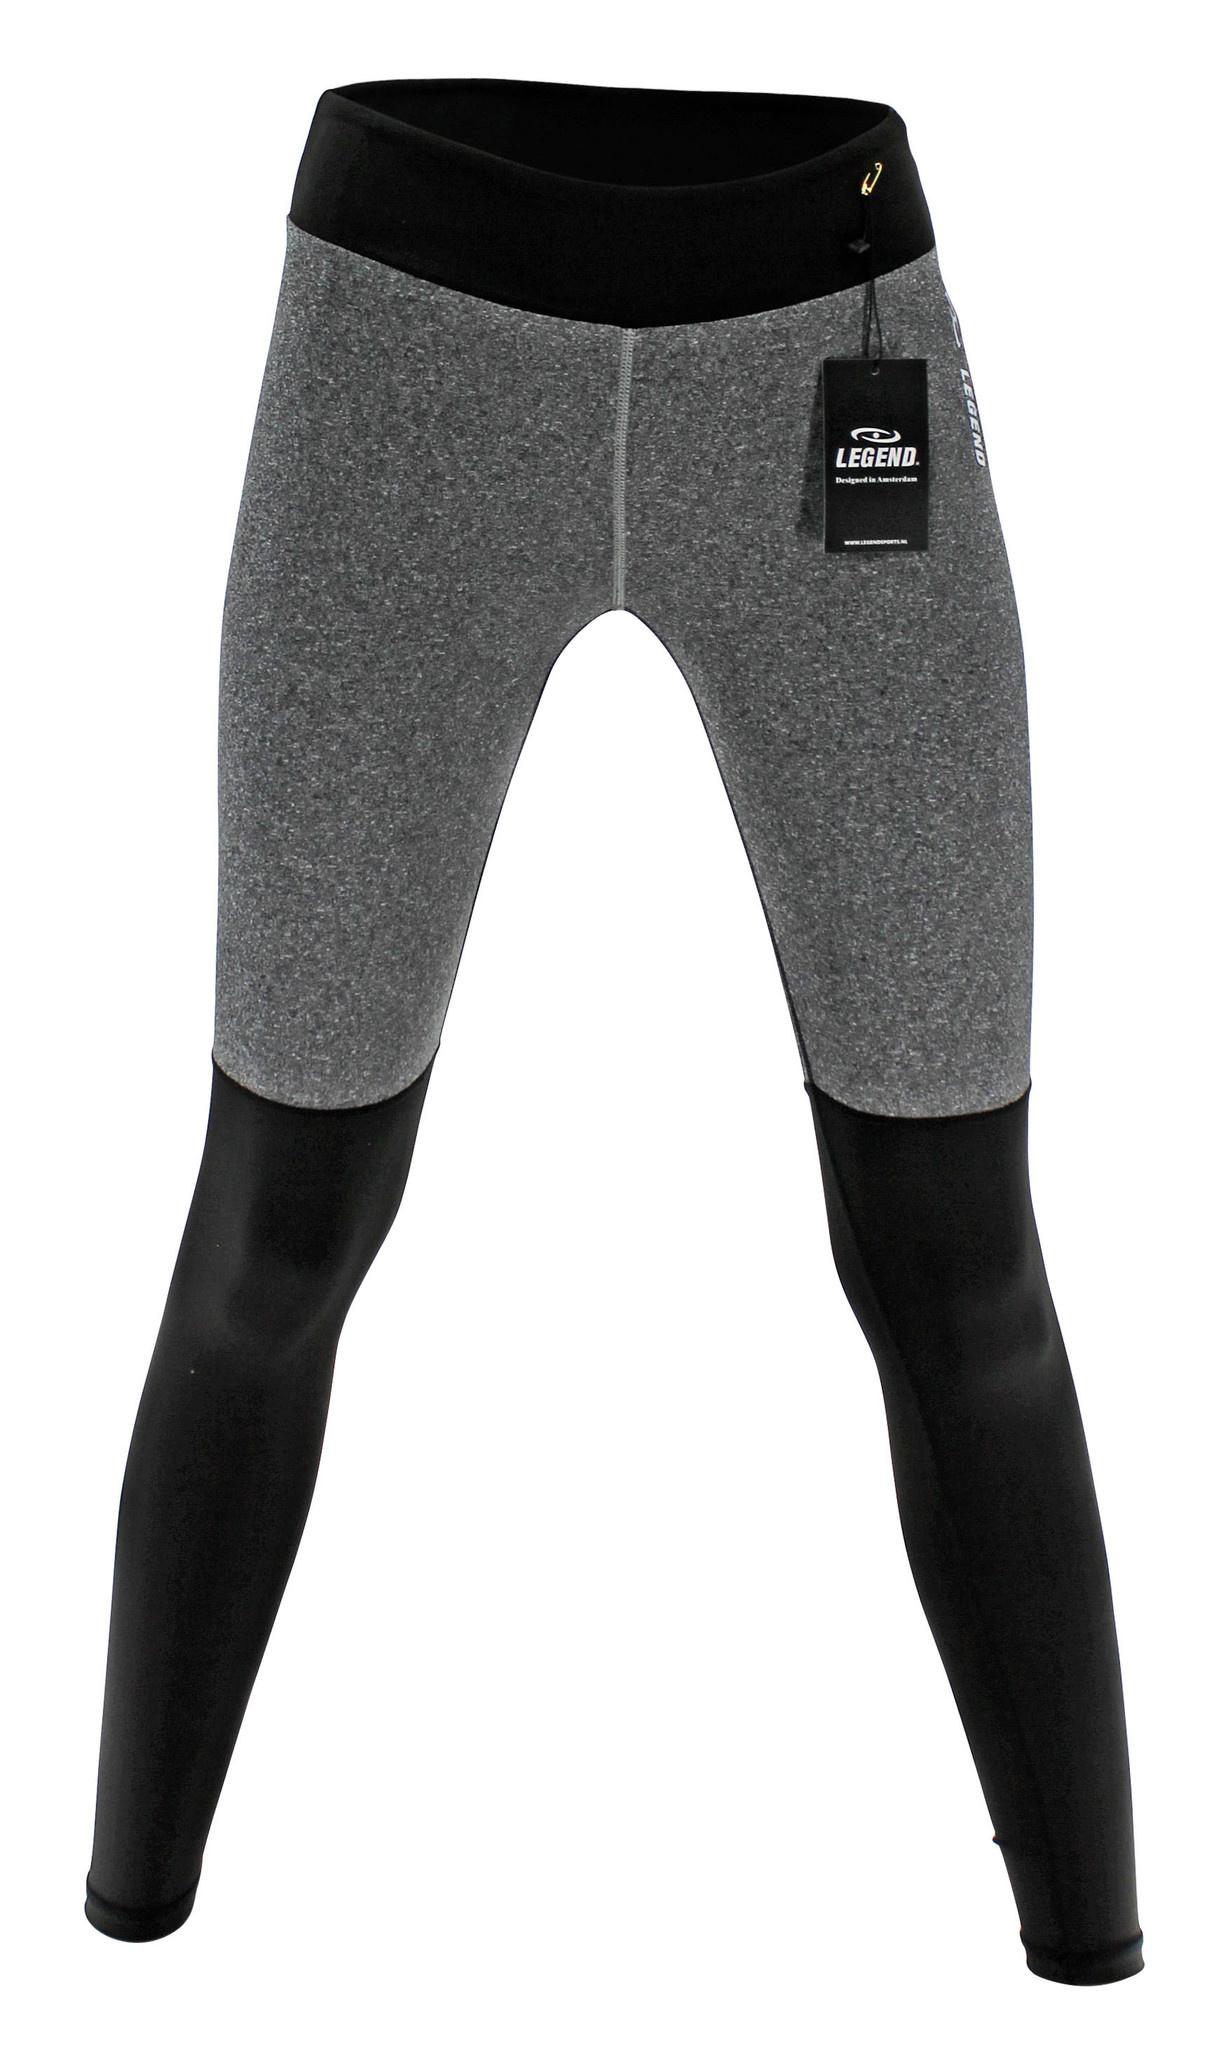 Sportlegging Black-Grey